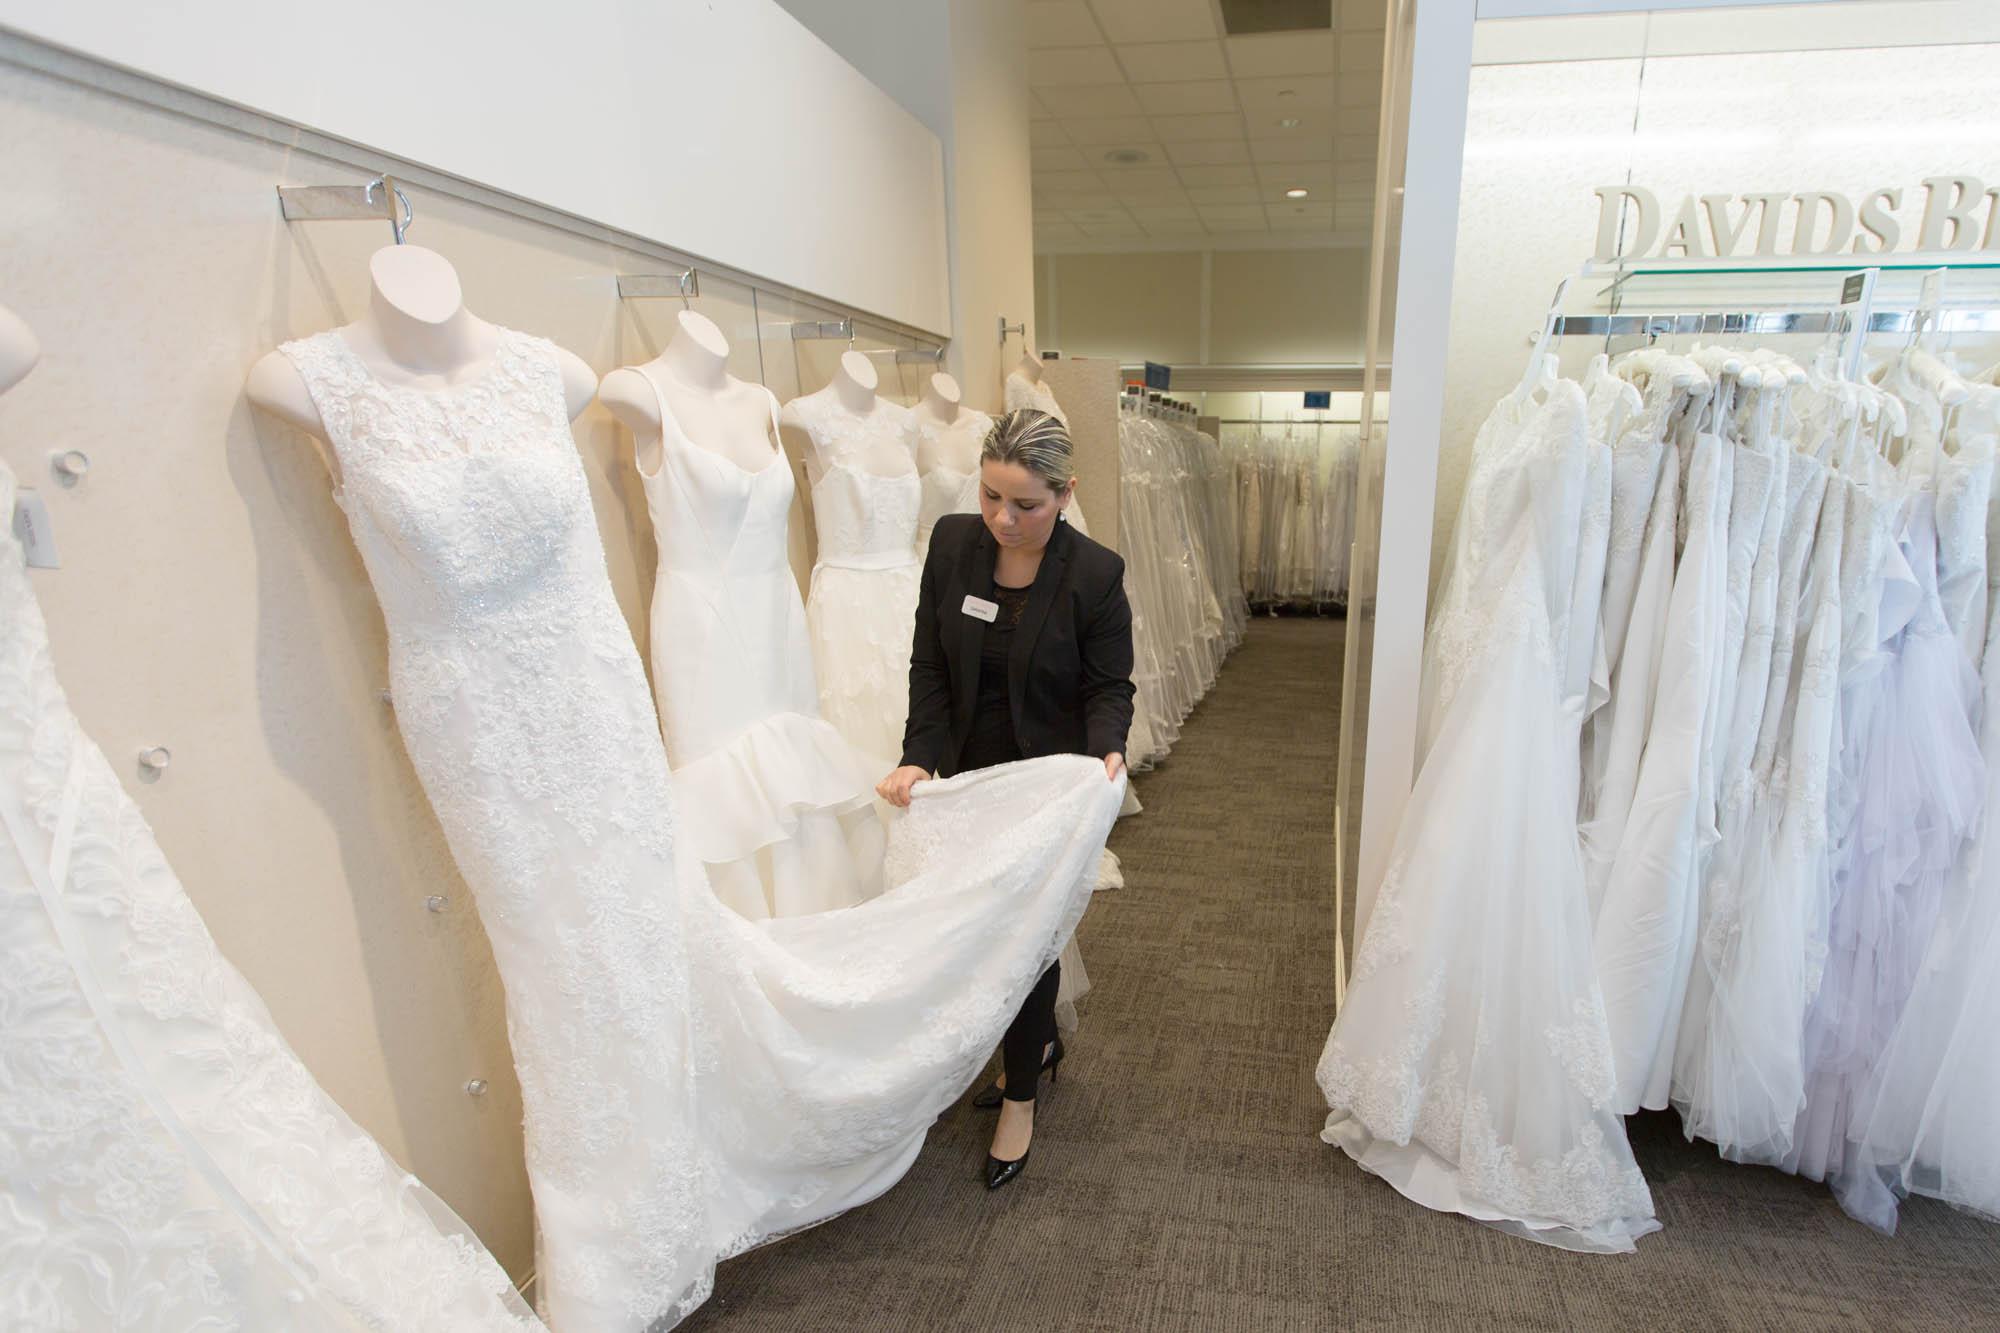 davids bridal wedding dress wedding dress garment bag A David s Bridal dress consultant tends to a display Photo by Alex Ulreich for Racked